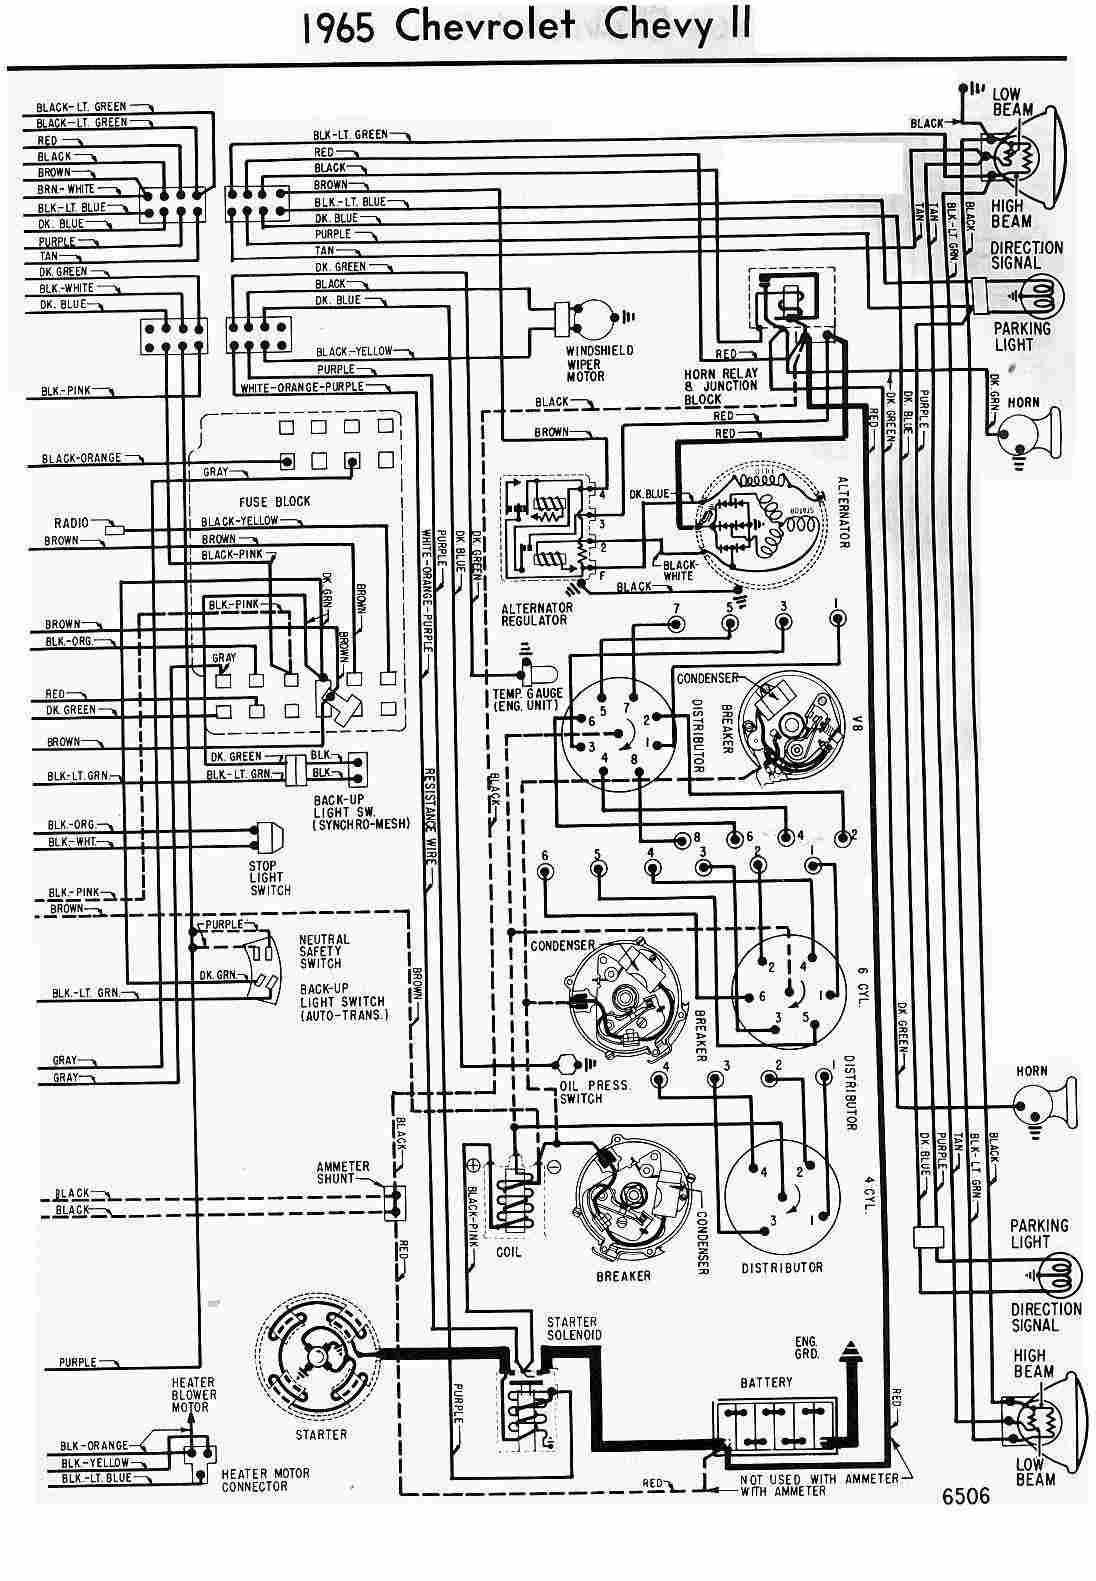 1968 Impala Turn Signal Wiring Diagram Circuit Schema 2005 Chevy Aveo For List Of Schematic U2022 Headlight Socket